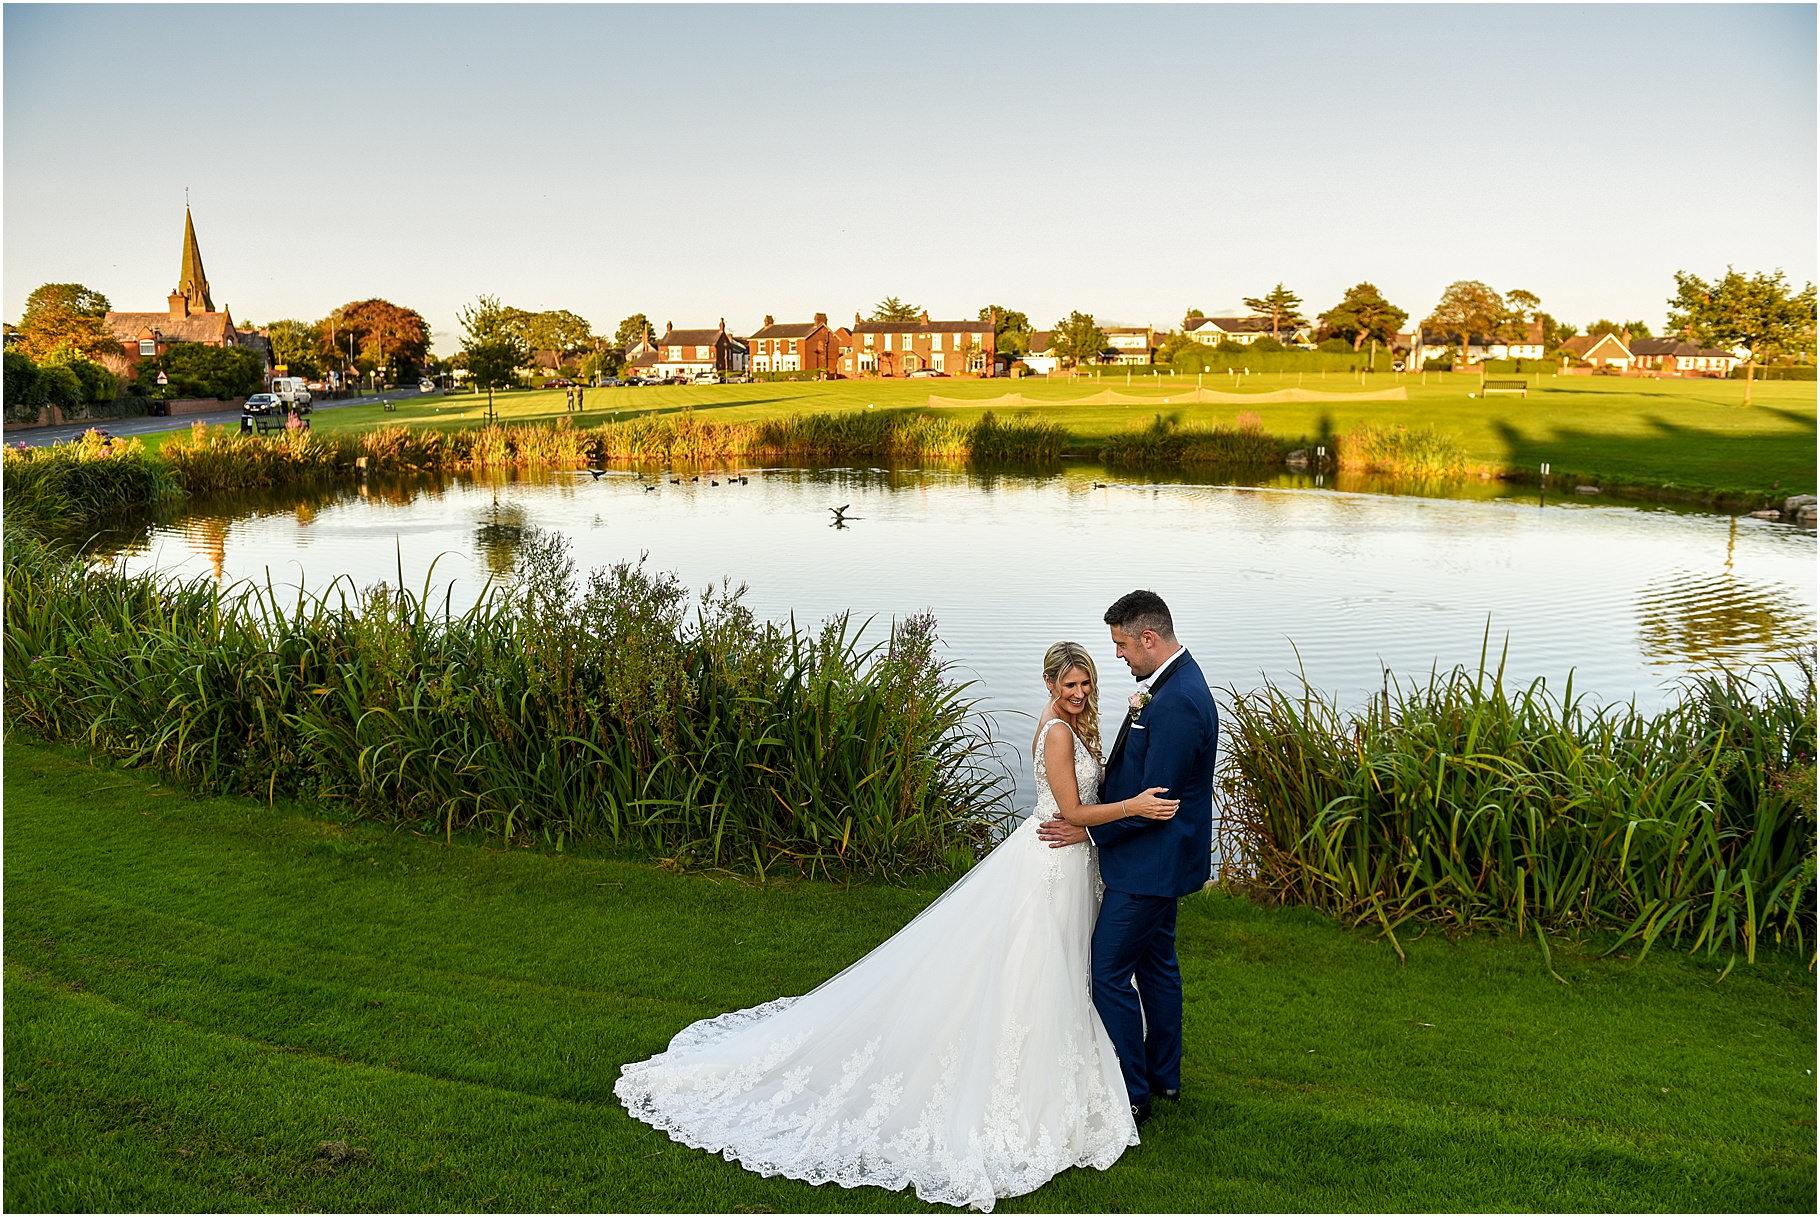 the-villa-wrea-green-wedding-58.jpg